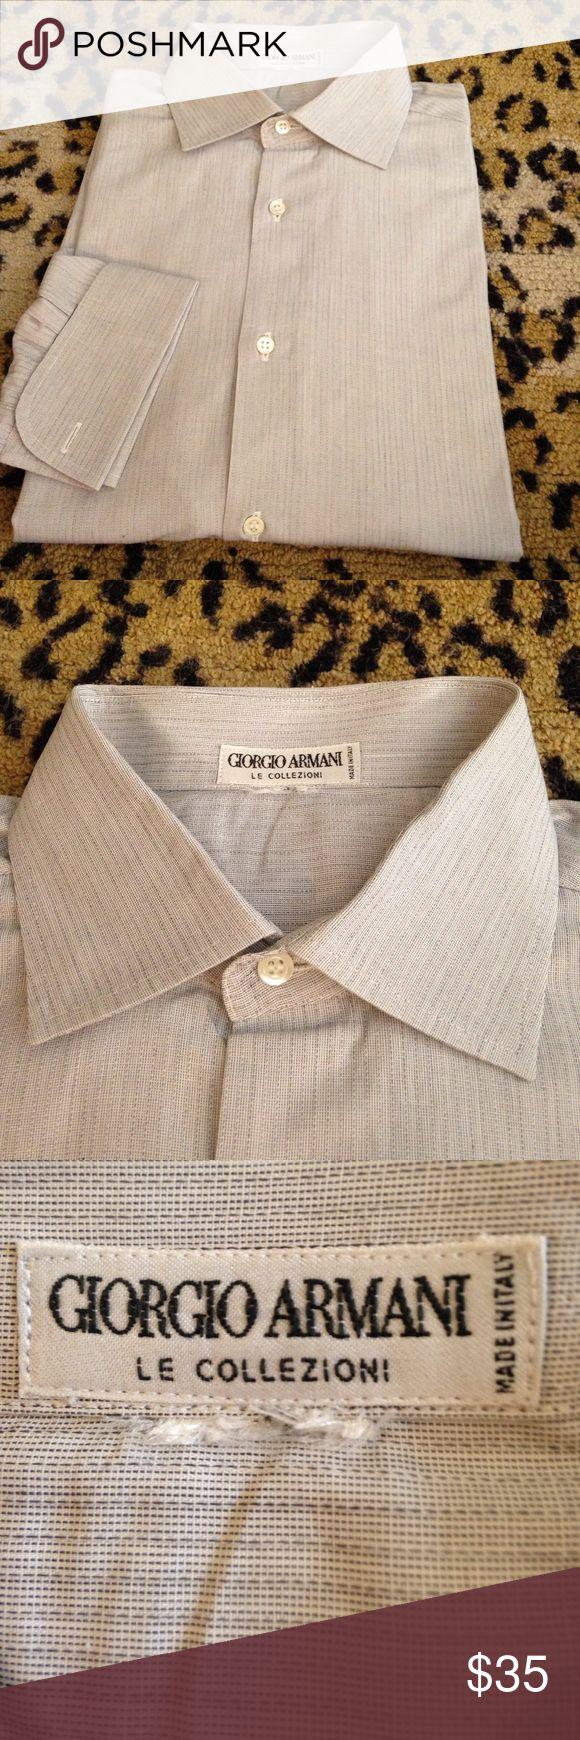 Giorgio Armani Gray French Cuff Shirt 16 34/35 Giorgio Armani Solid Gray Stripe French Cuff Dress Shirt size 16 34/35! Great condition! Please make reasonable offers and bundle! Ask questions! :) Giorgio Armani Shirts Dress Shirts